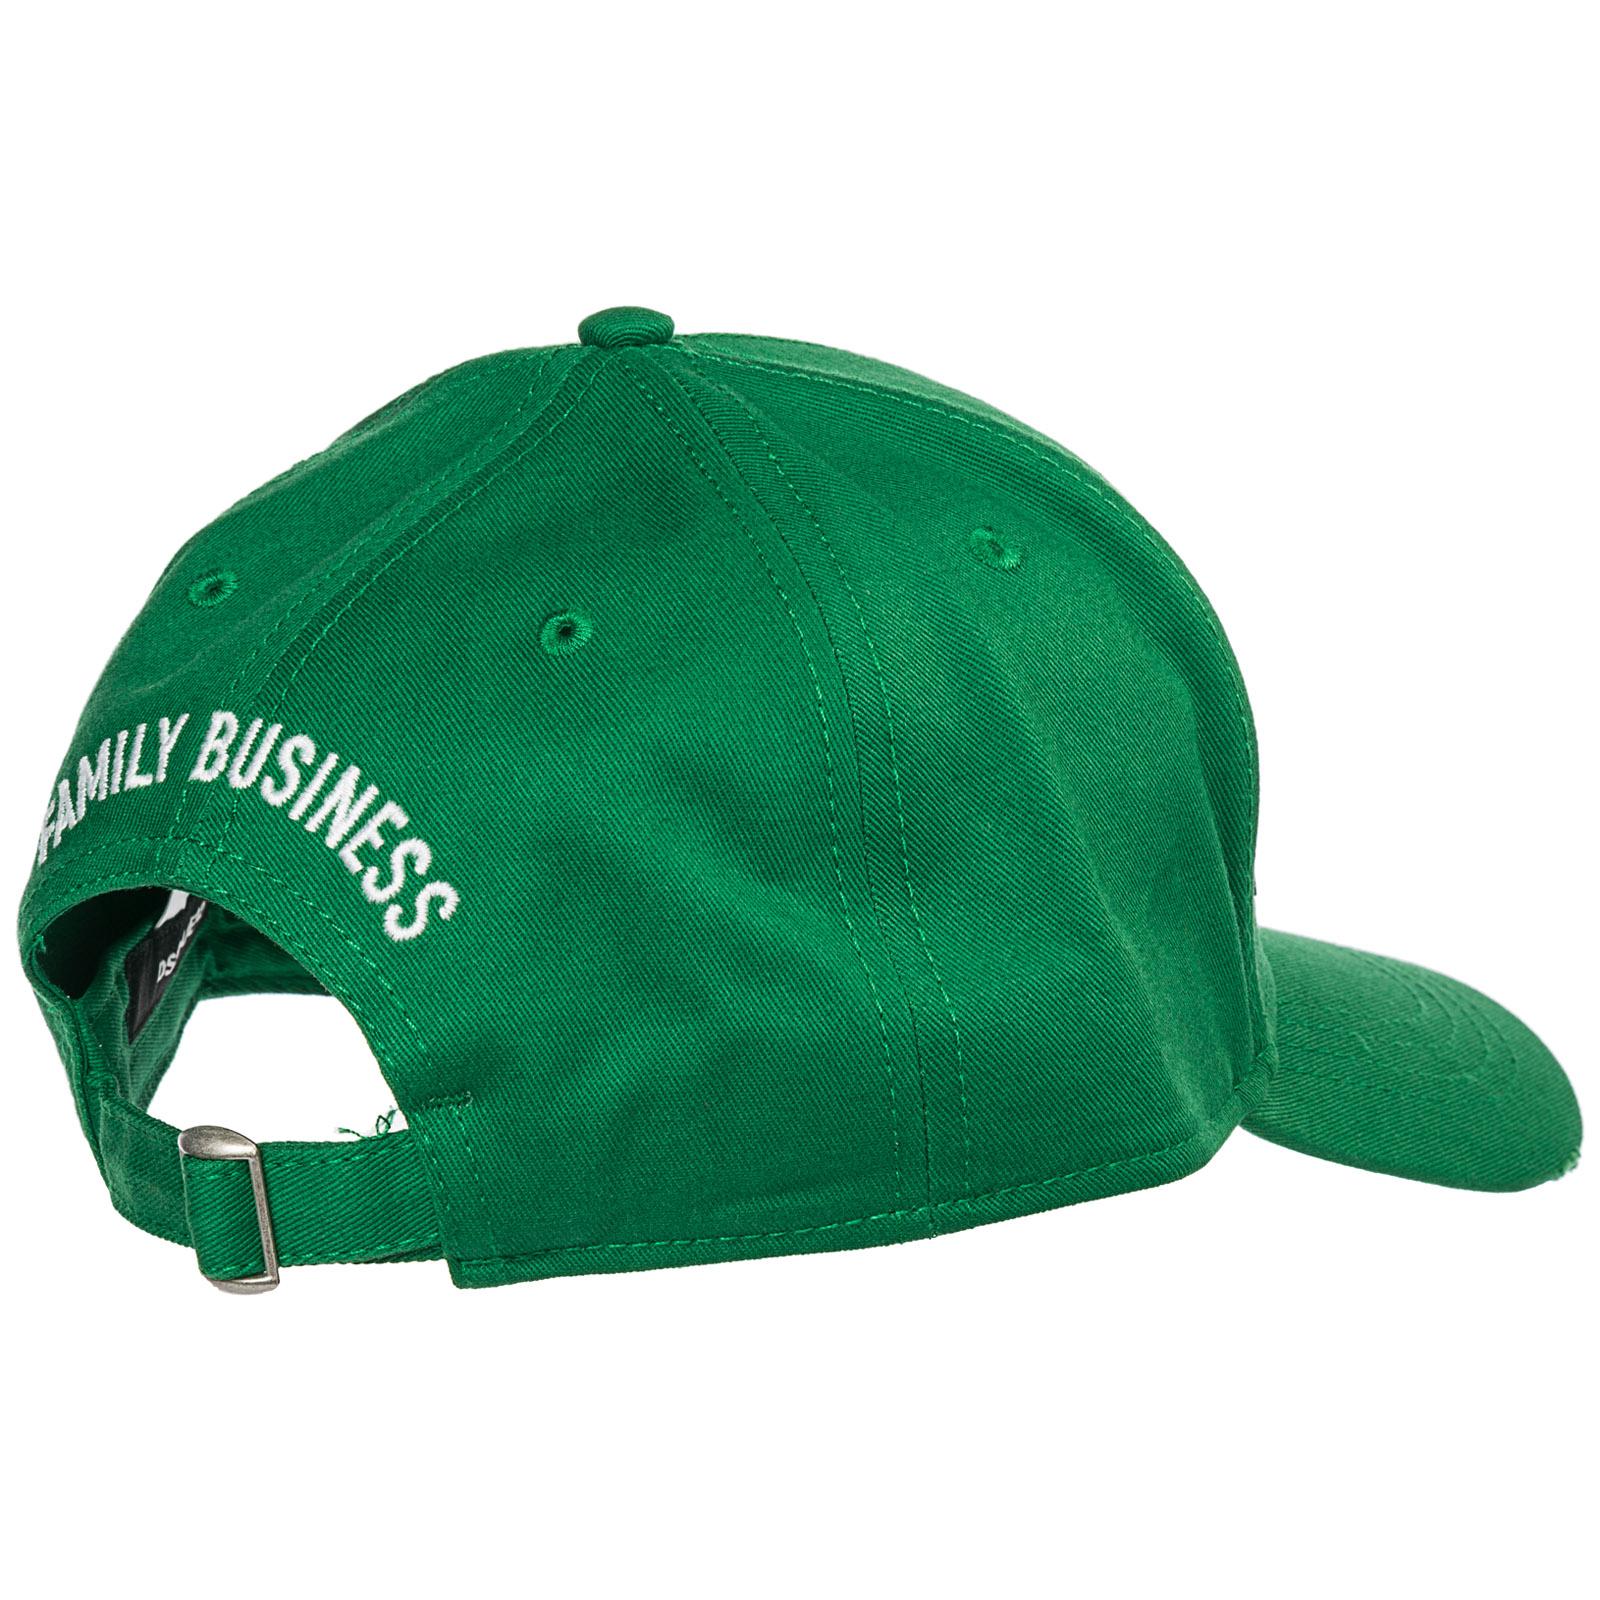 Adjustable men's cotton hat baseball cap